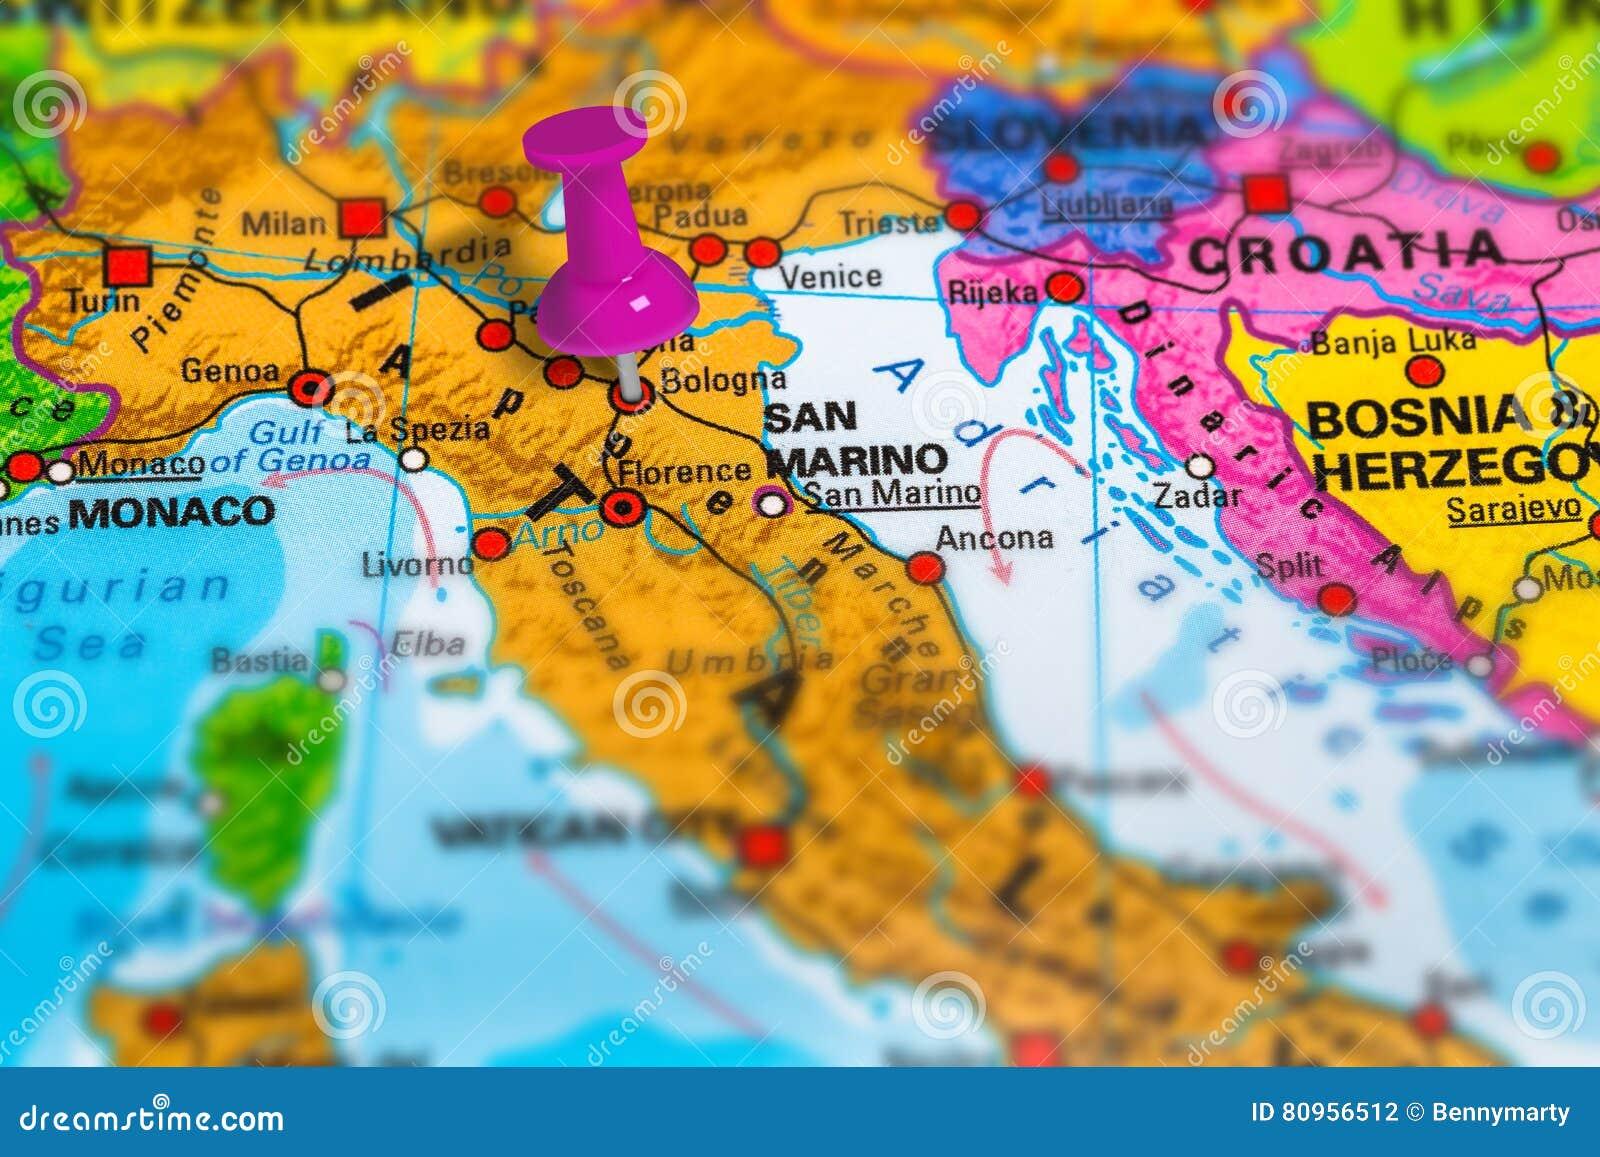 Monaco Italien Karte.Bologna Italien Karte Stockfoto Bild Von Karte Konzept